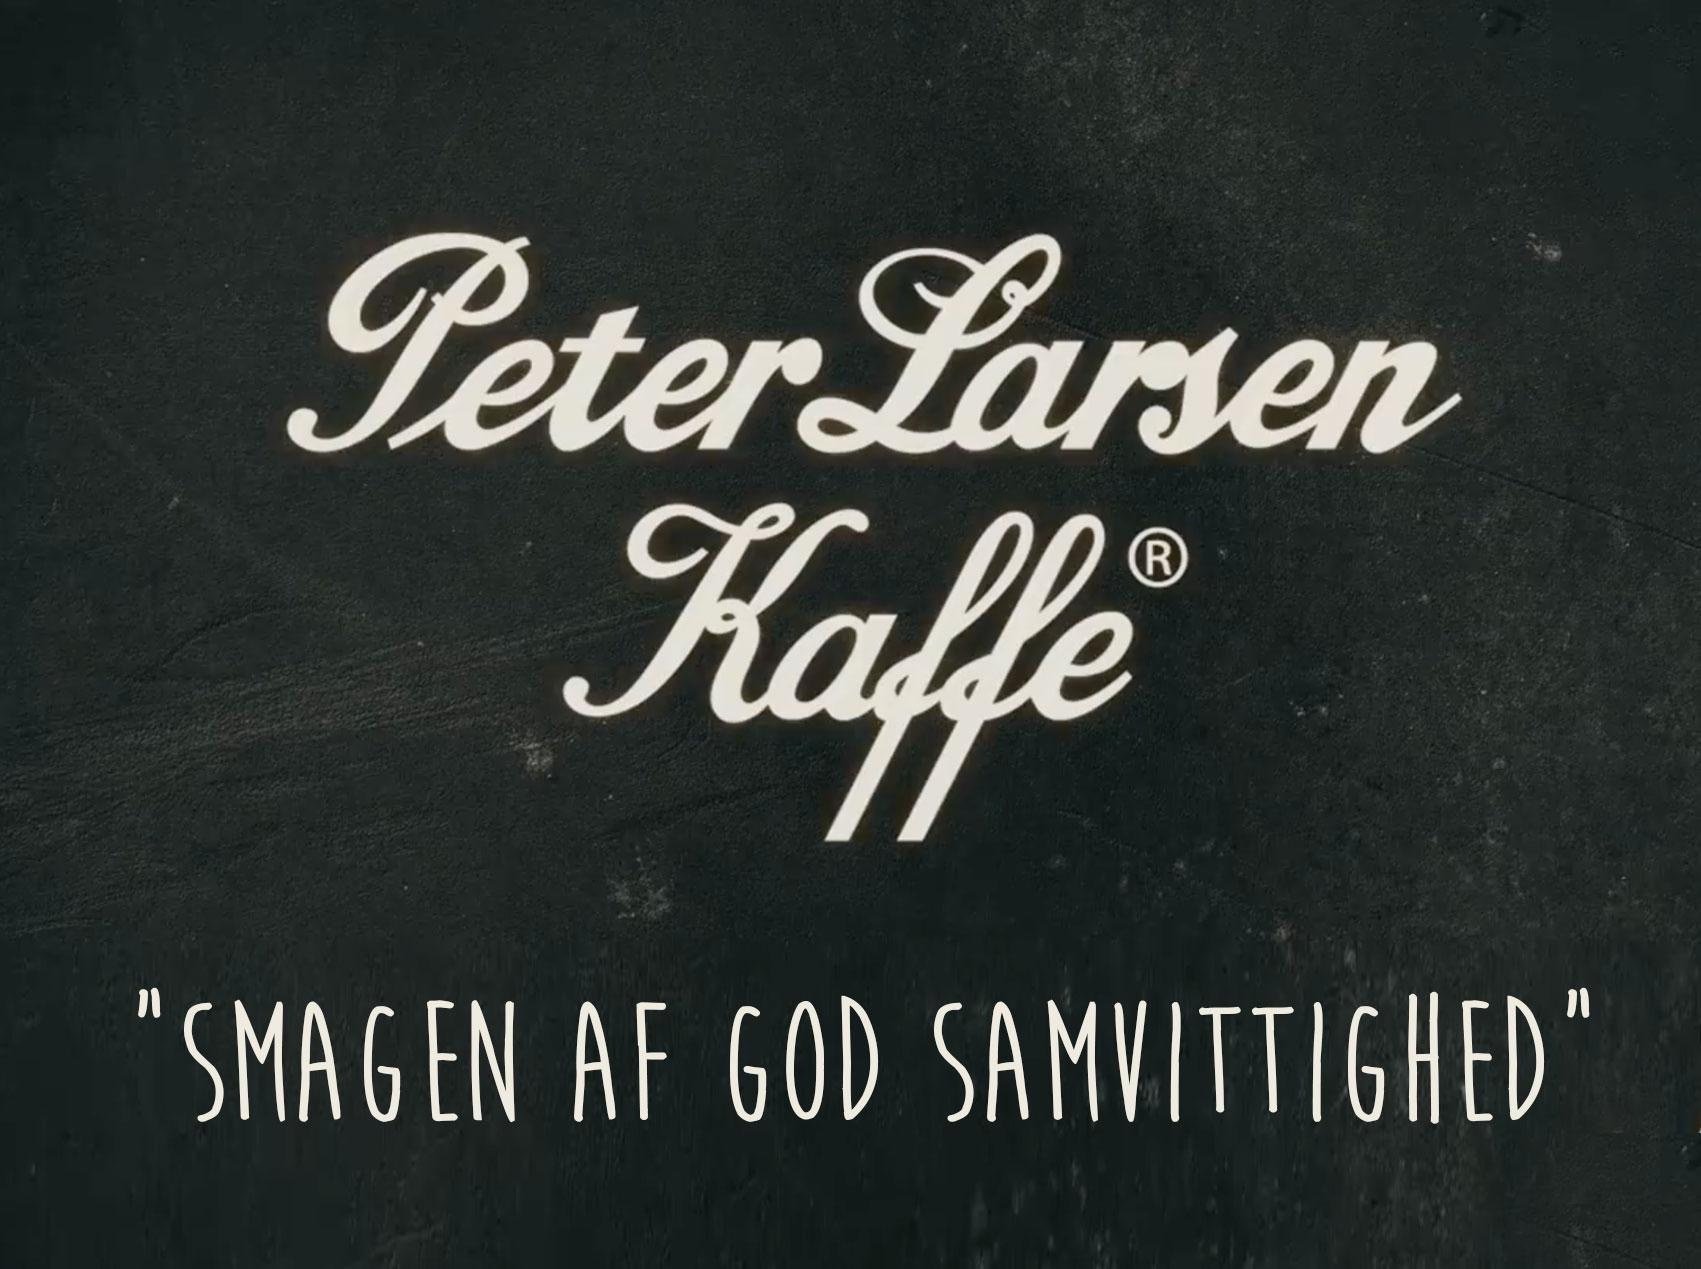 Peter Larsen Coffee